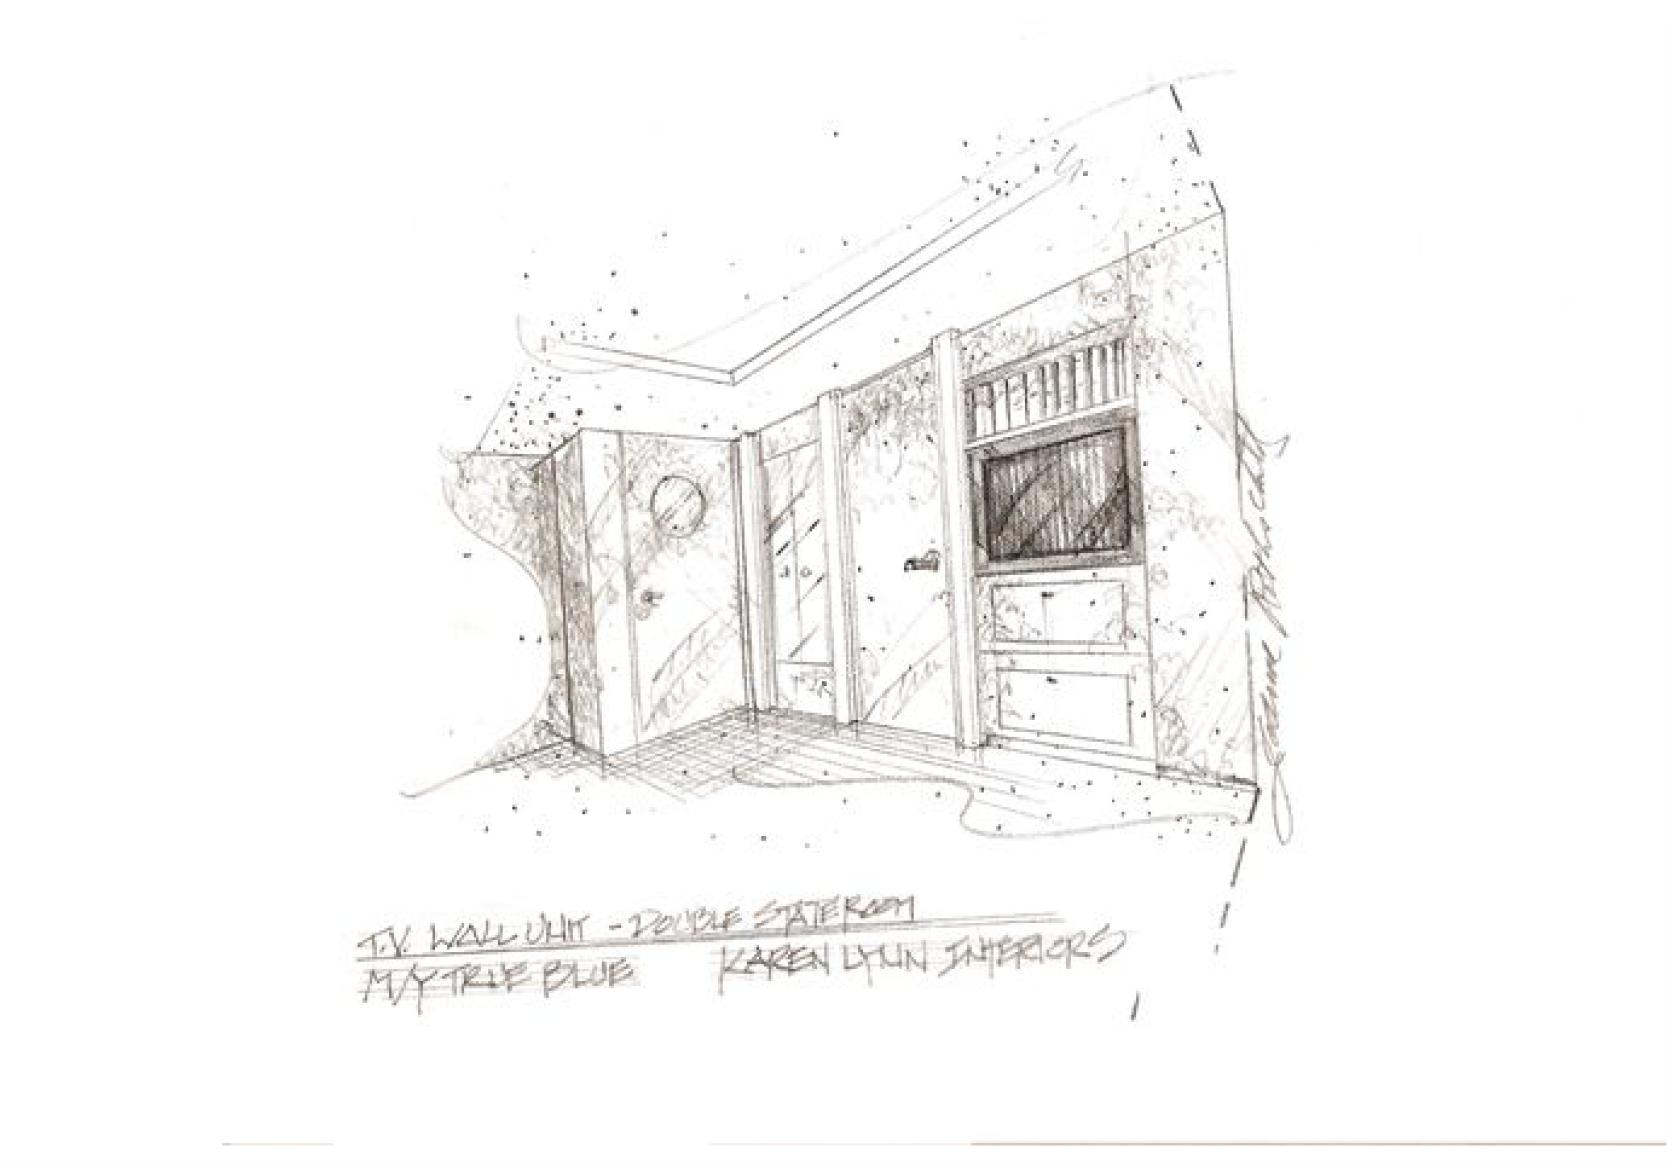 Karen-Lynn-Interior-Design-Yacht-Obsession-31.jpg